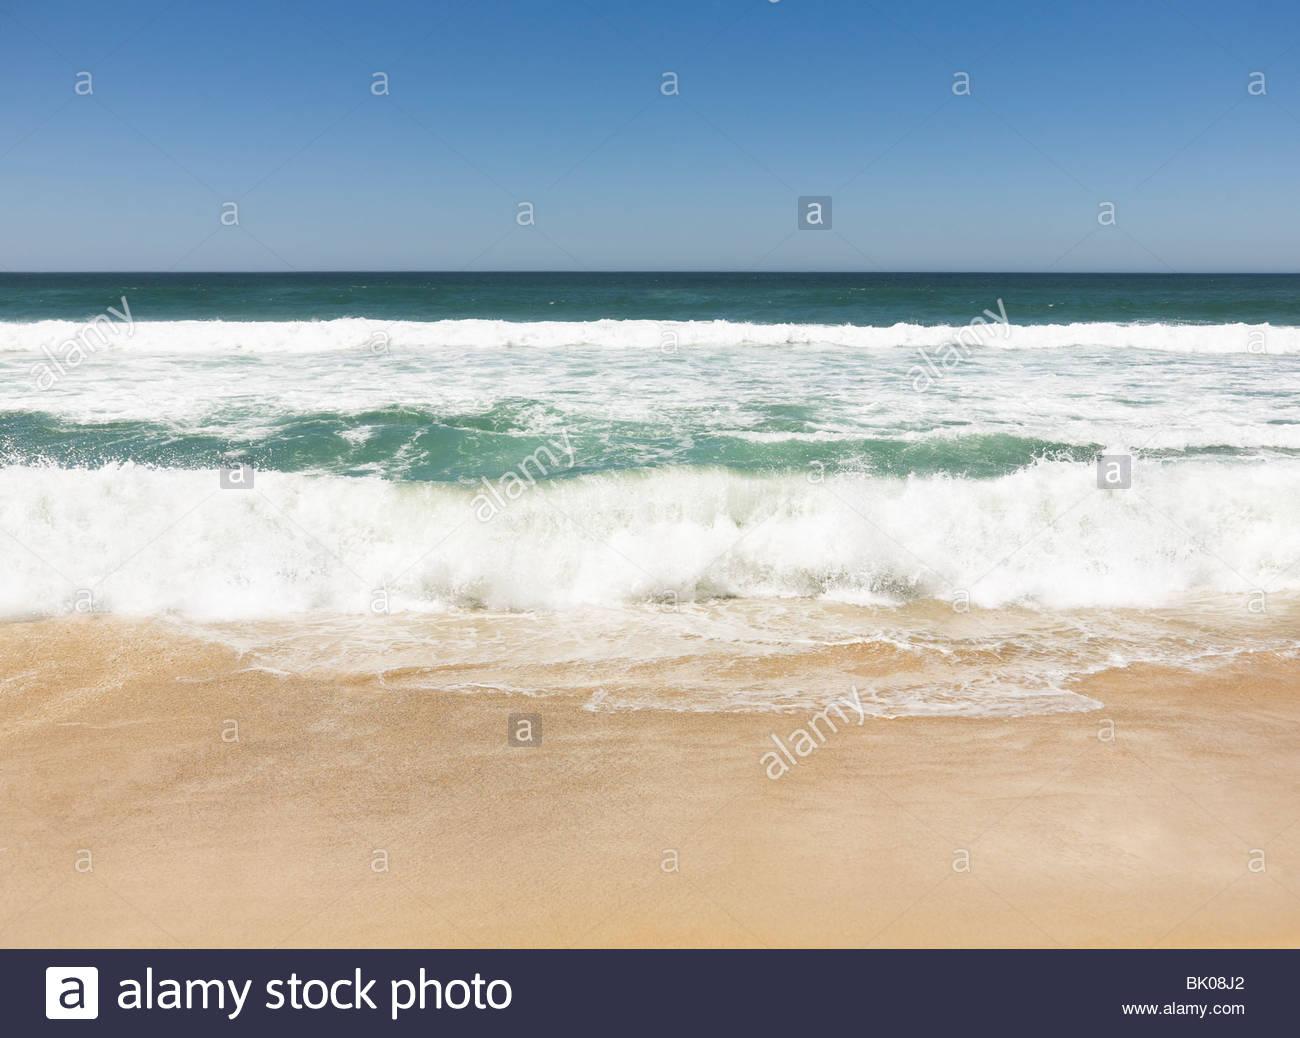 Waves breaking onto beach - Stock Image